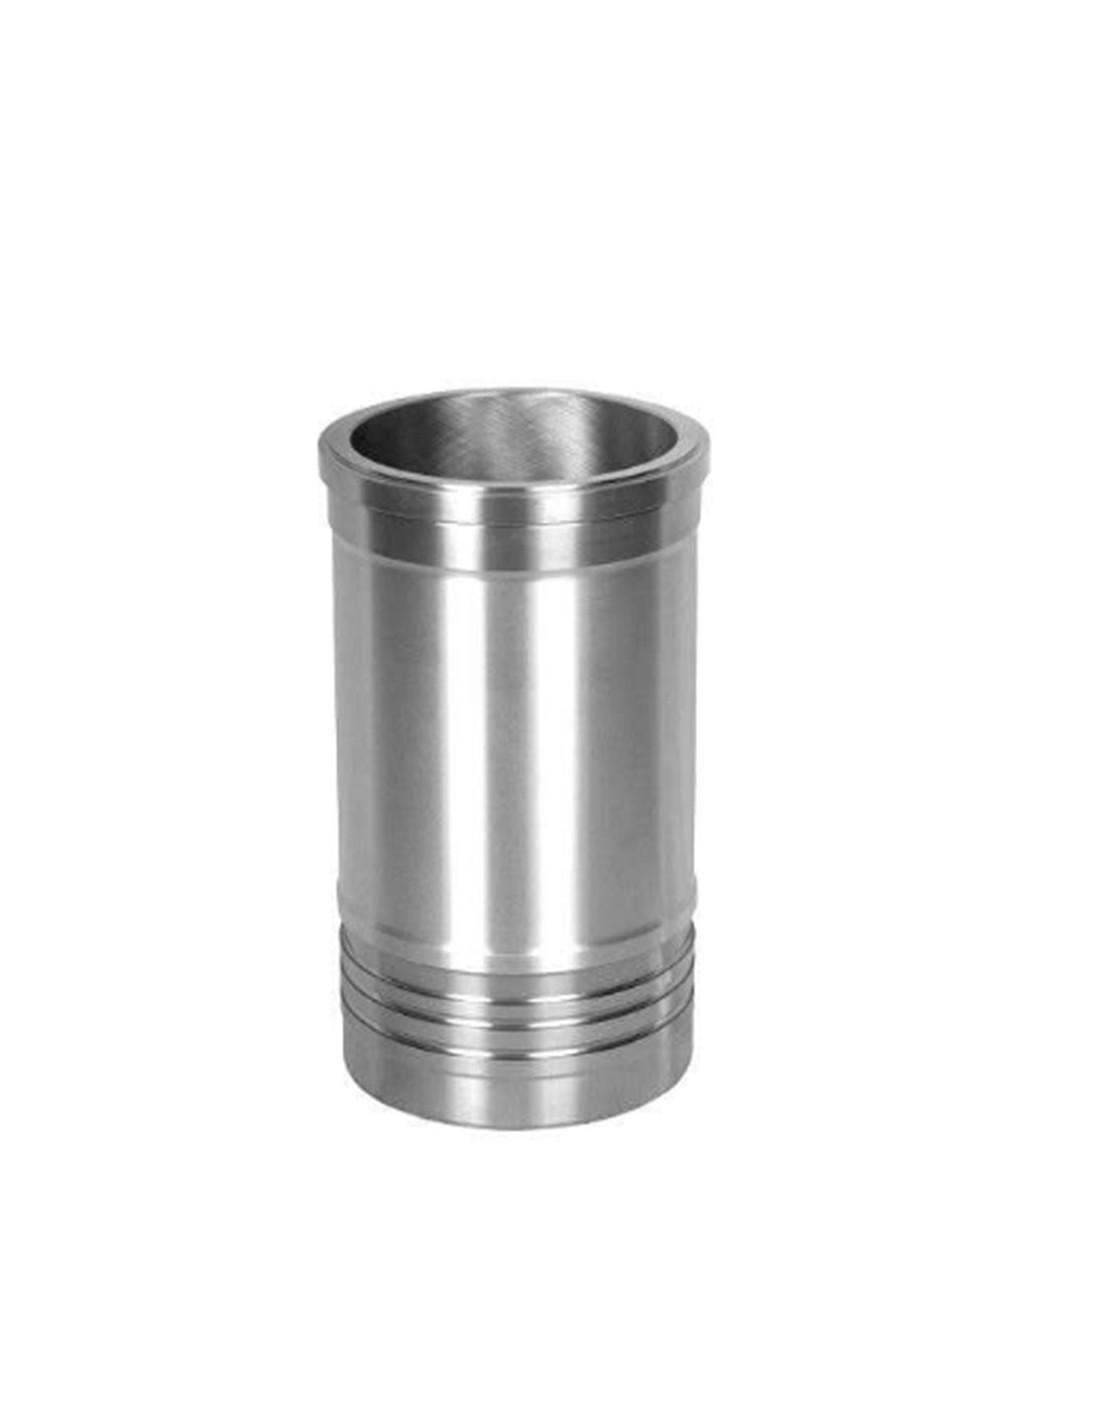 http://jumbosan.com.tr/wp-content/uploads/Engine-Spare-Parts-M11-3080760-Cylinder-Sleeve-r165-jumbosan-machine-company-gilzy-cilindrov-dlya-promyshlennykh-dizelnykh-dvigatelej.jpg